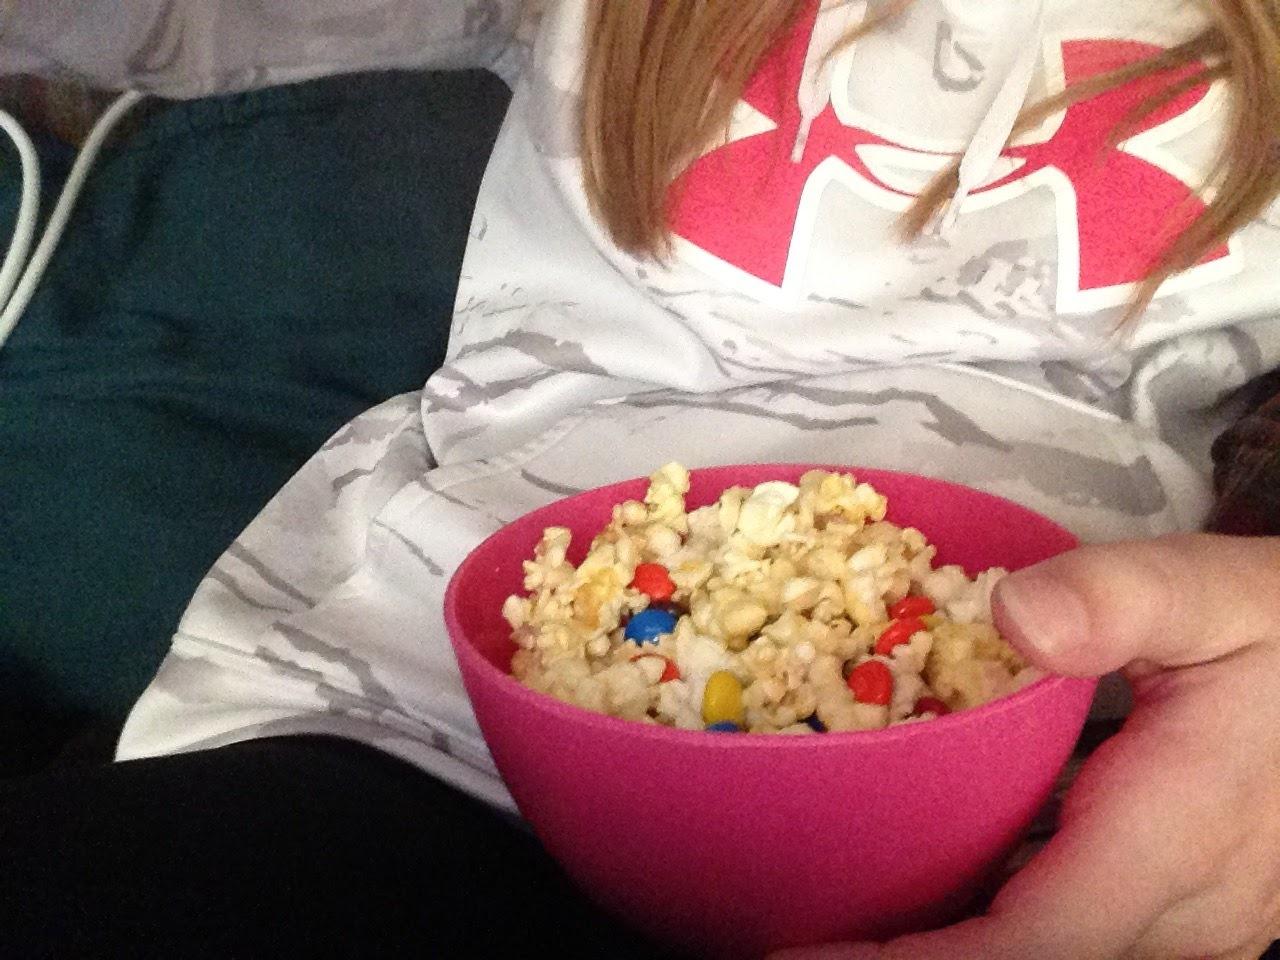 Ashlee-Popcorn-and-M&MS.jpg